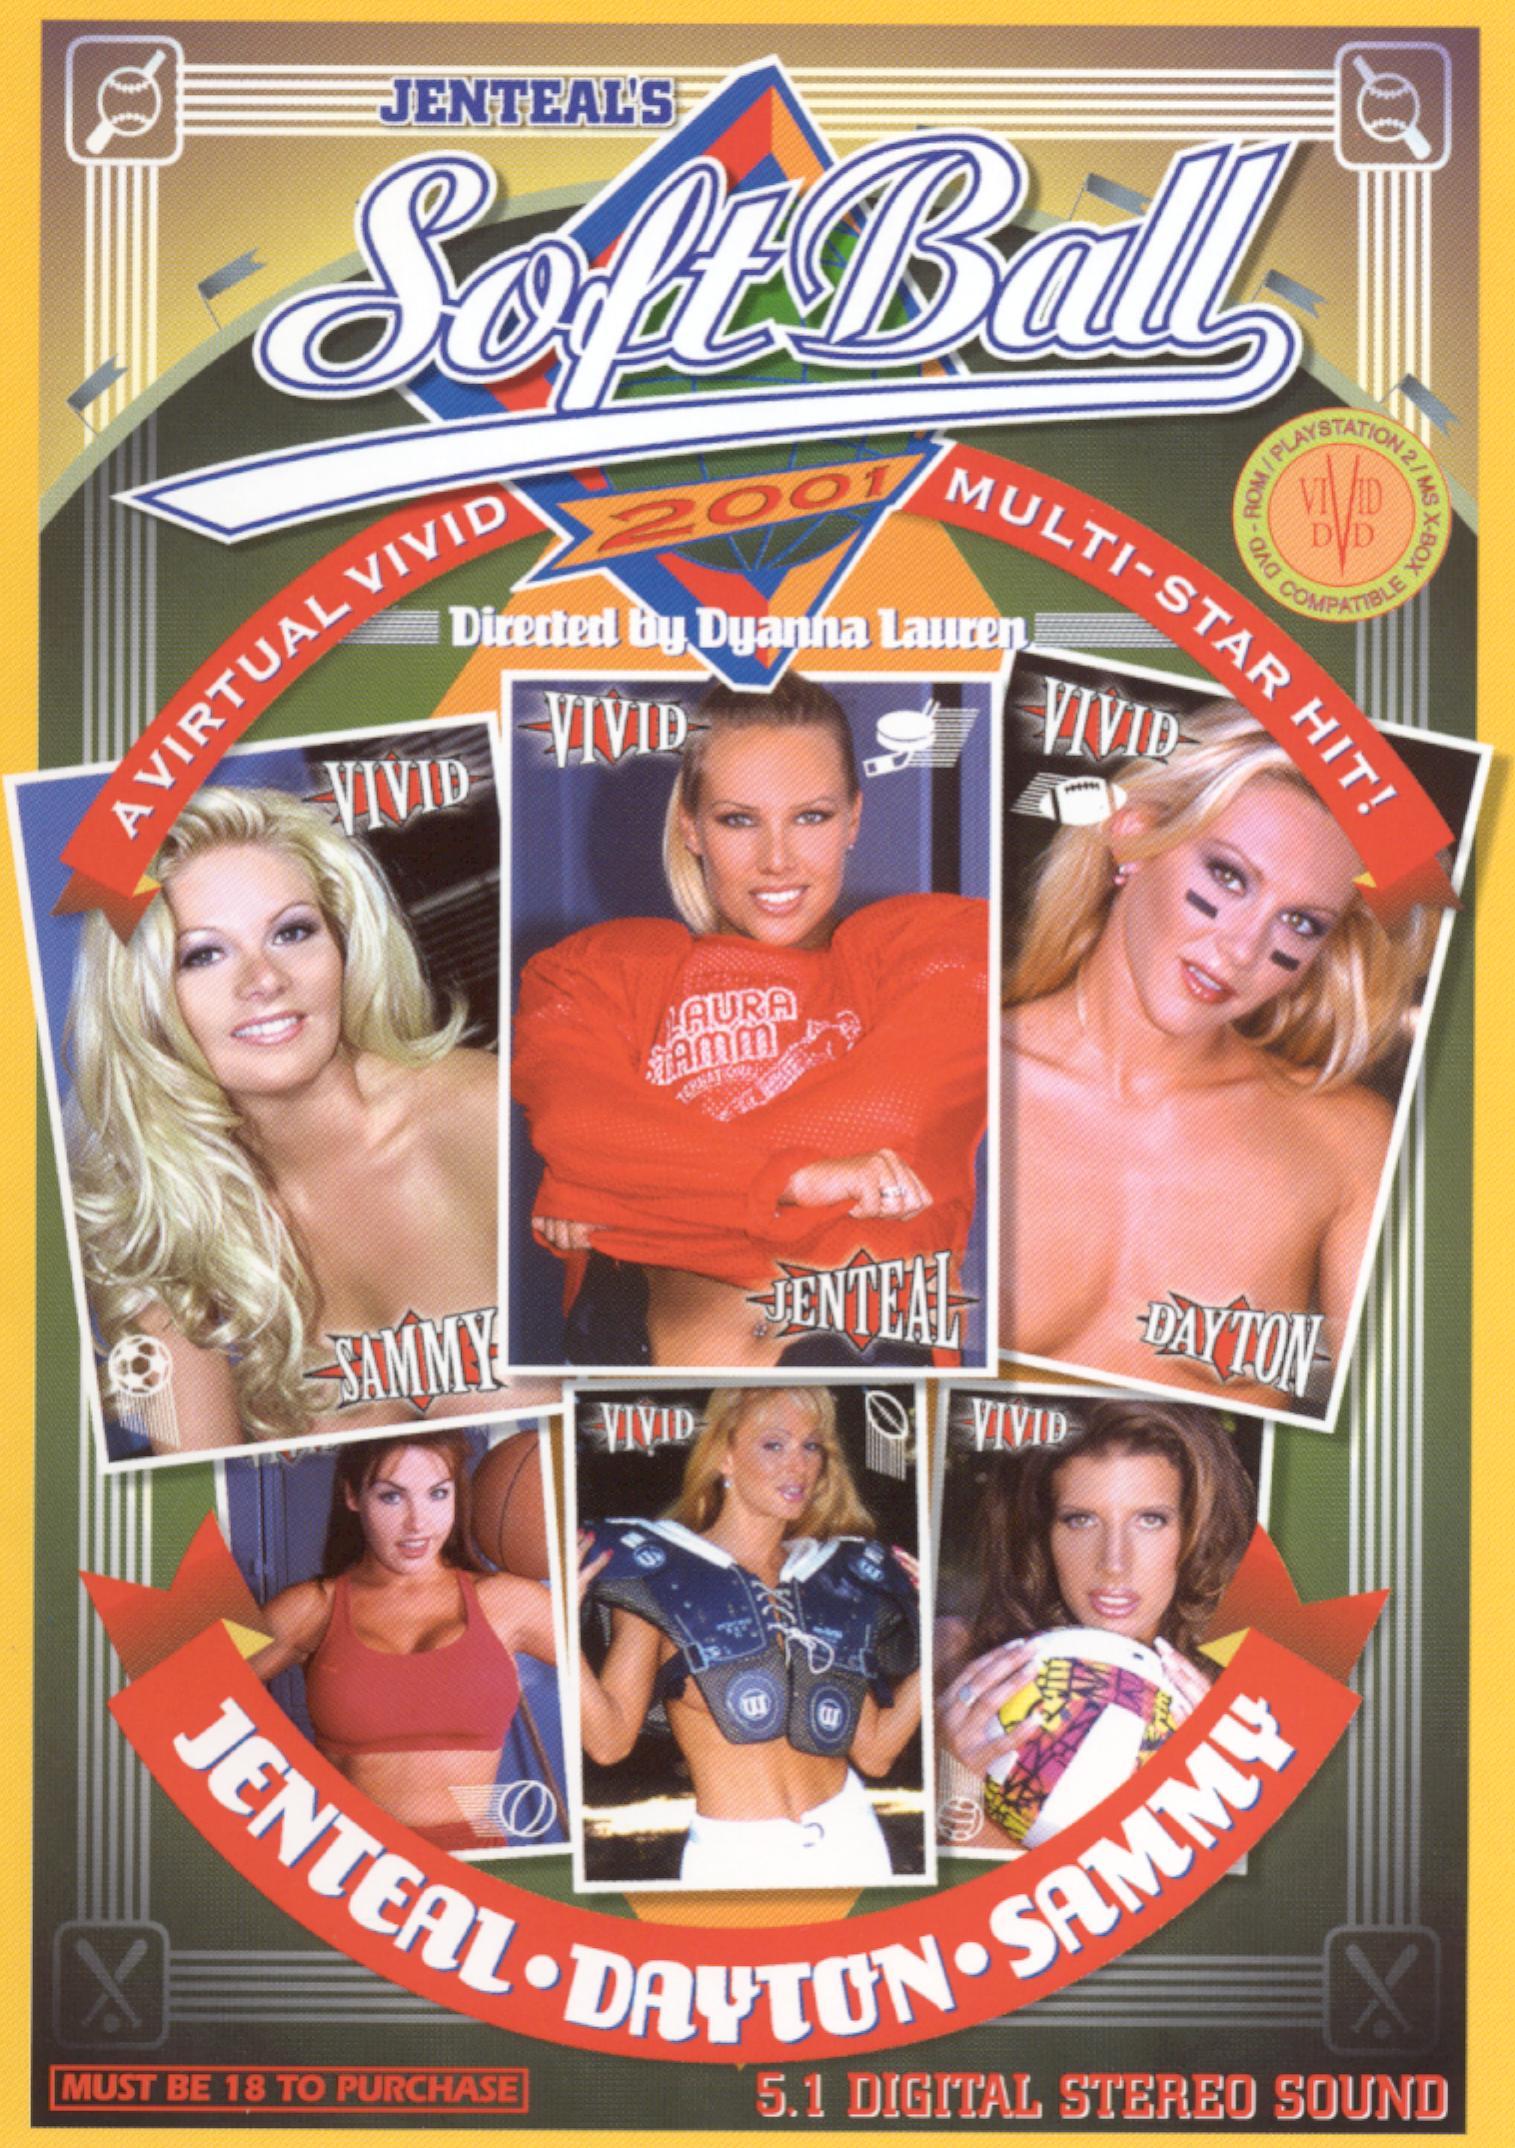 Dyanna: Jenteal's Softball 2001